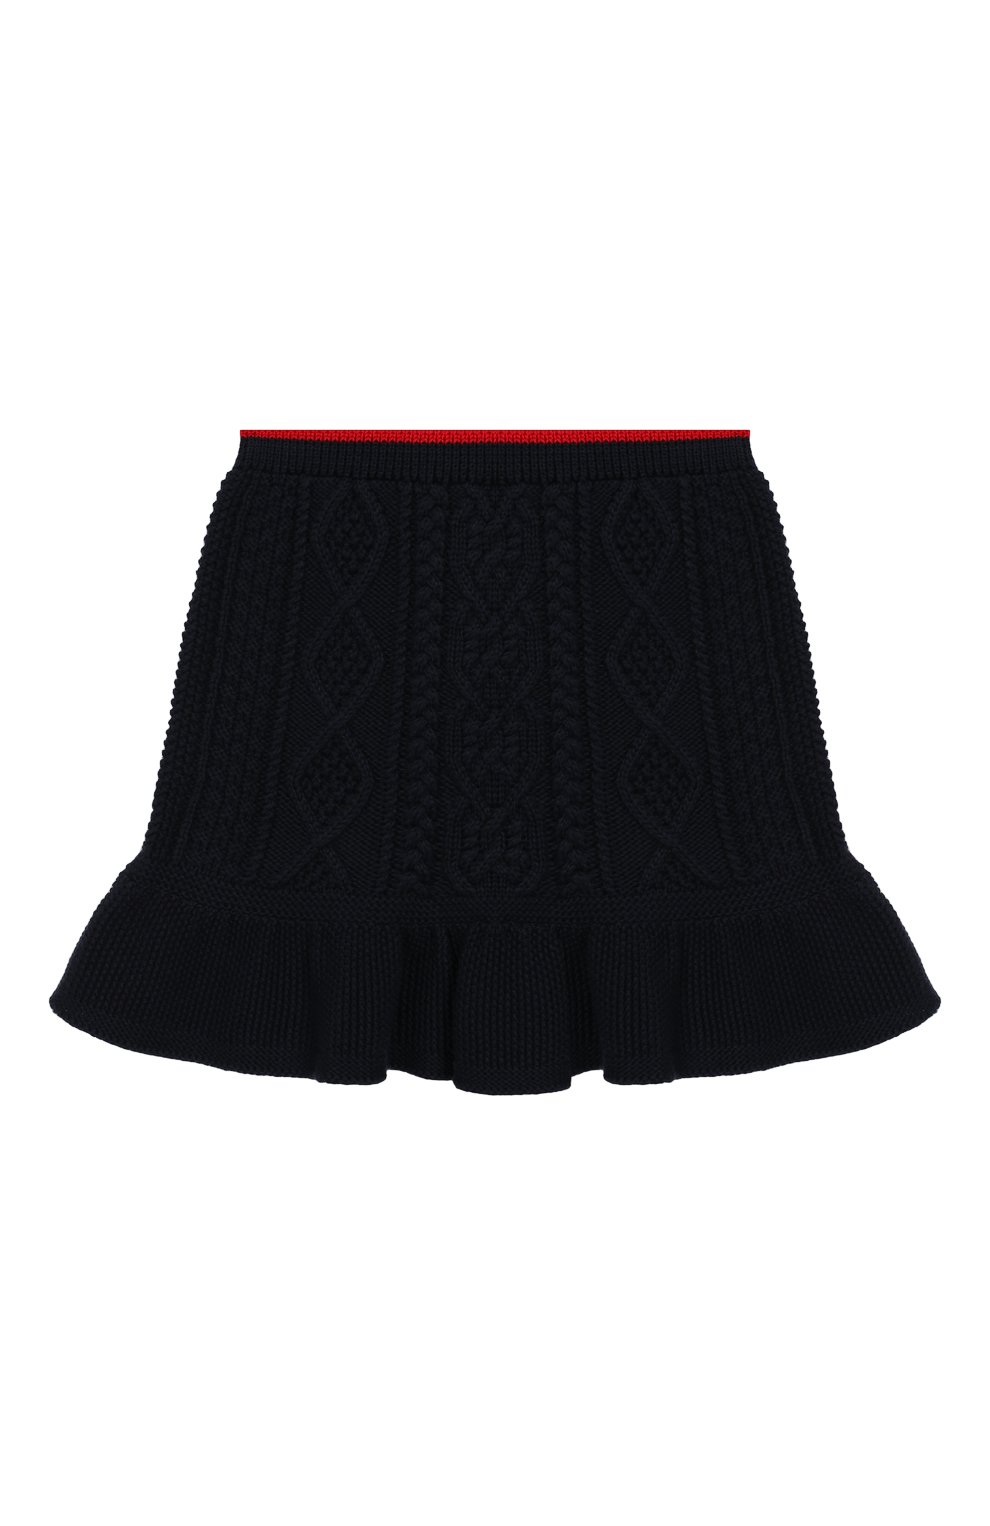 Детский комплект из юбки и топа POLO RALPH LAUREN синего цвета, арт. 313736827 | Фото 4